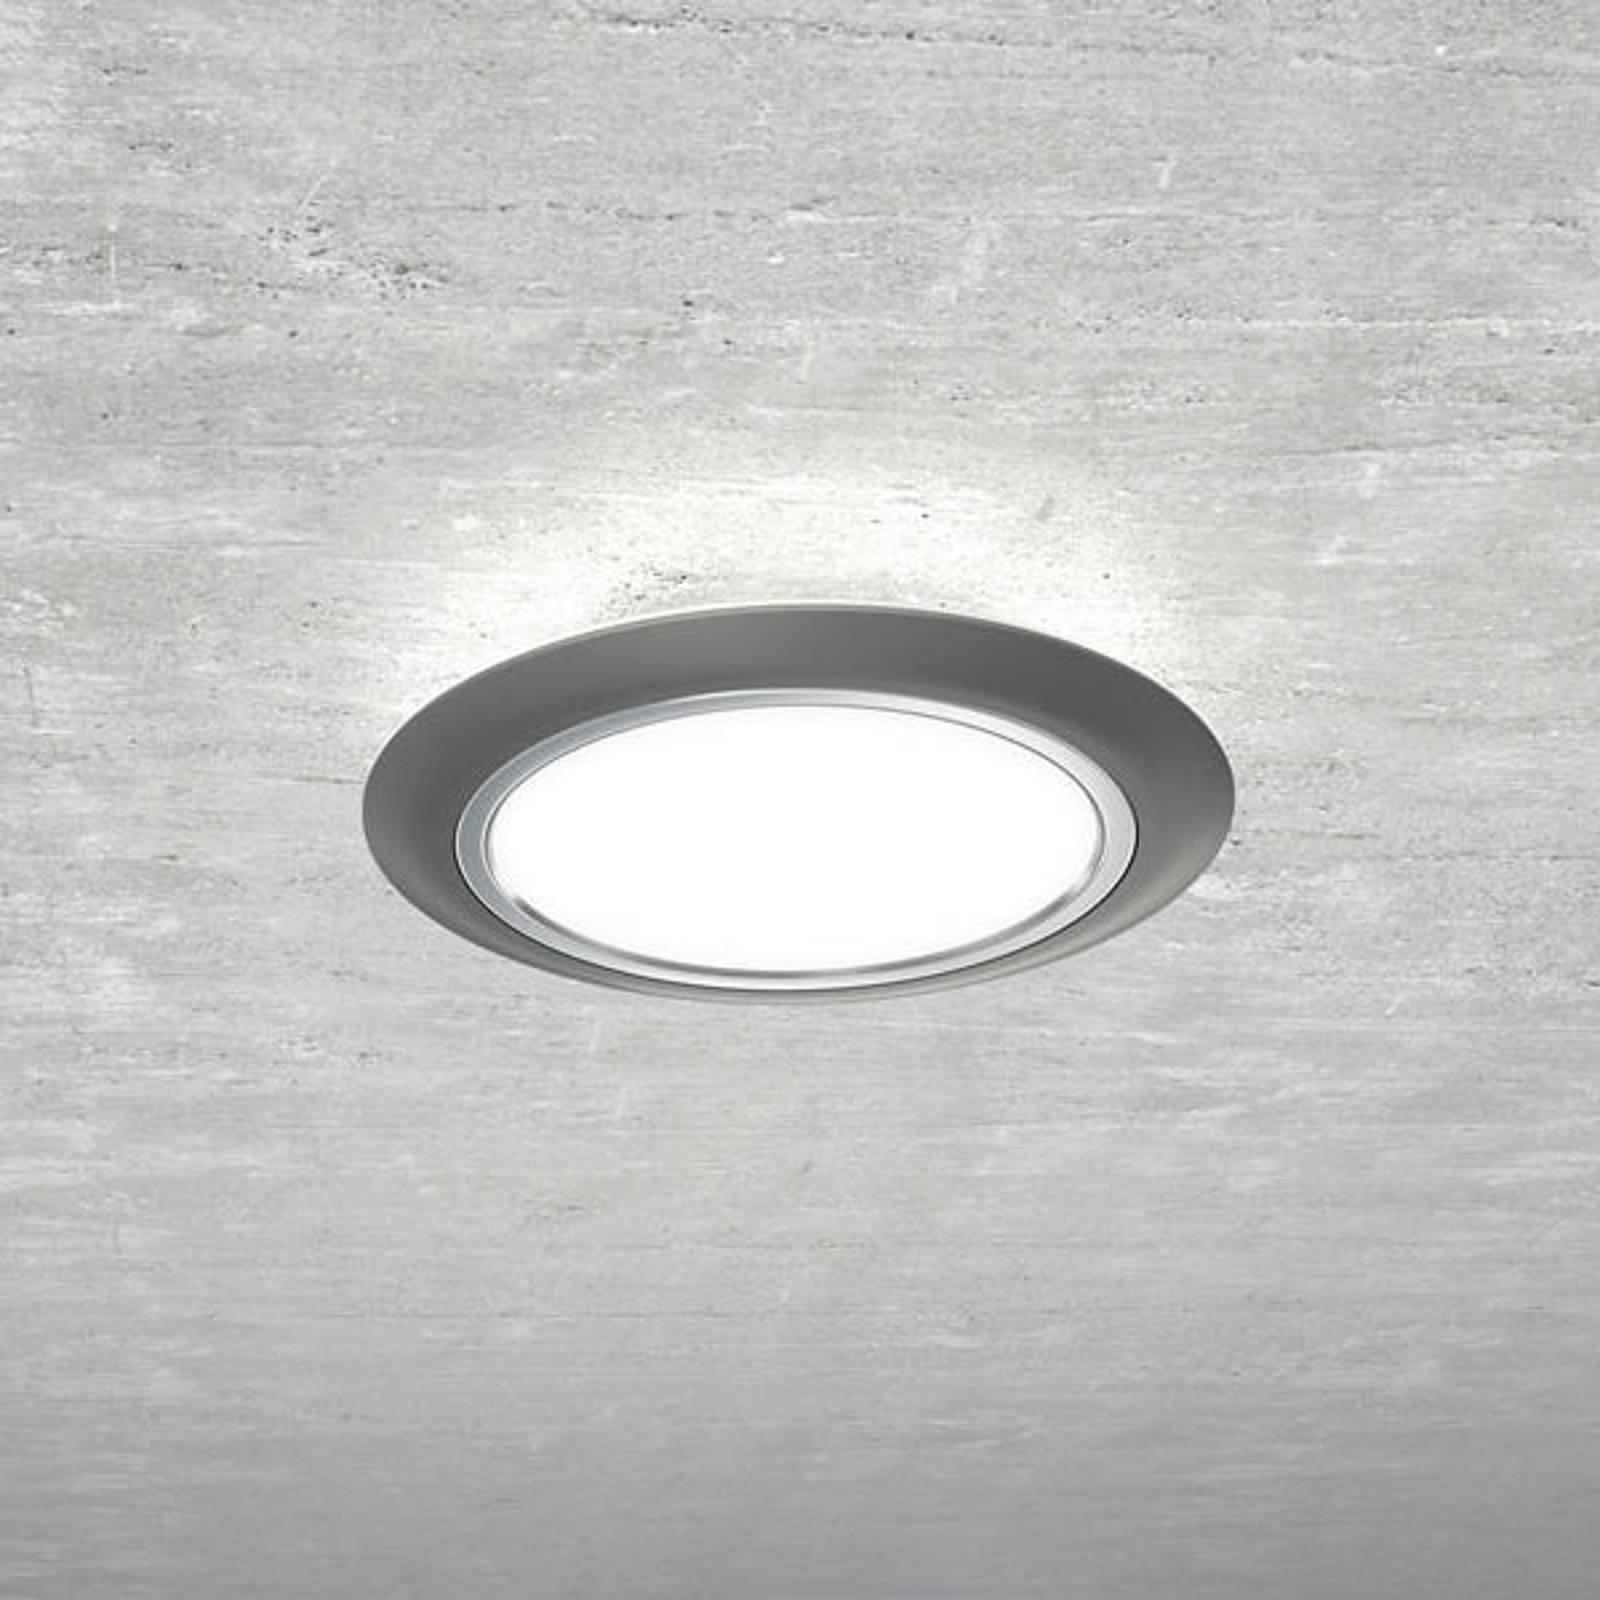 GU5,3 5 W 840 lavvolts LED-reflektor 36° 4 000 K